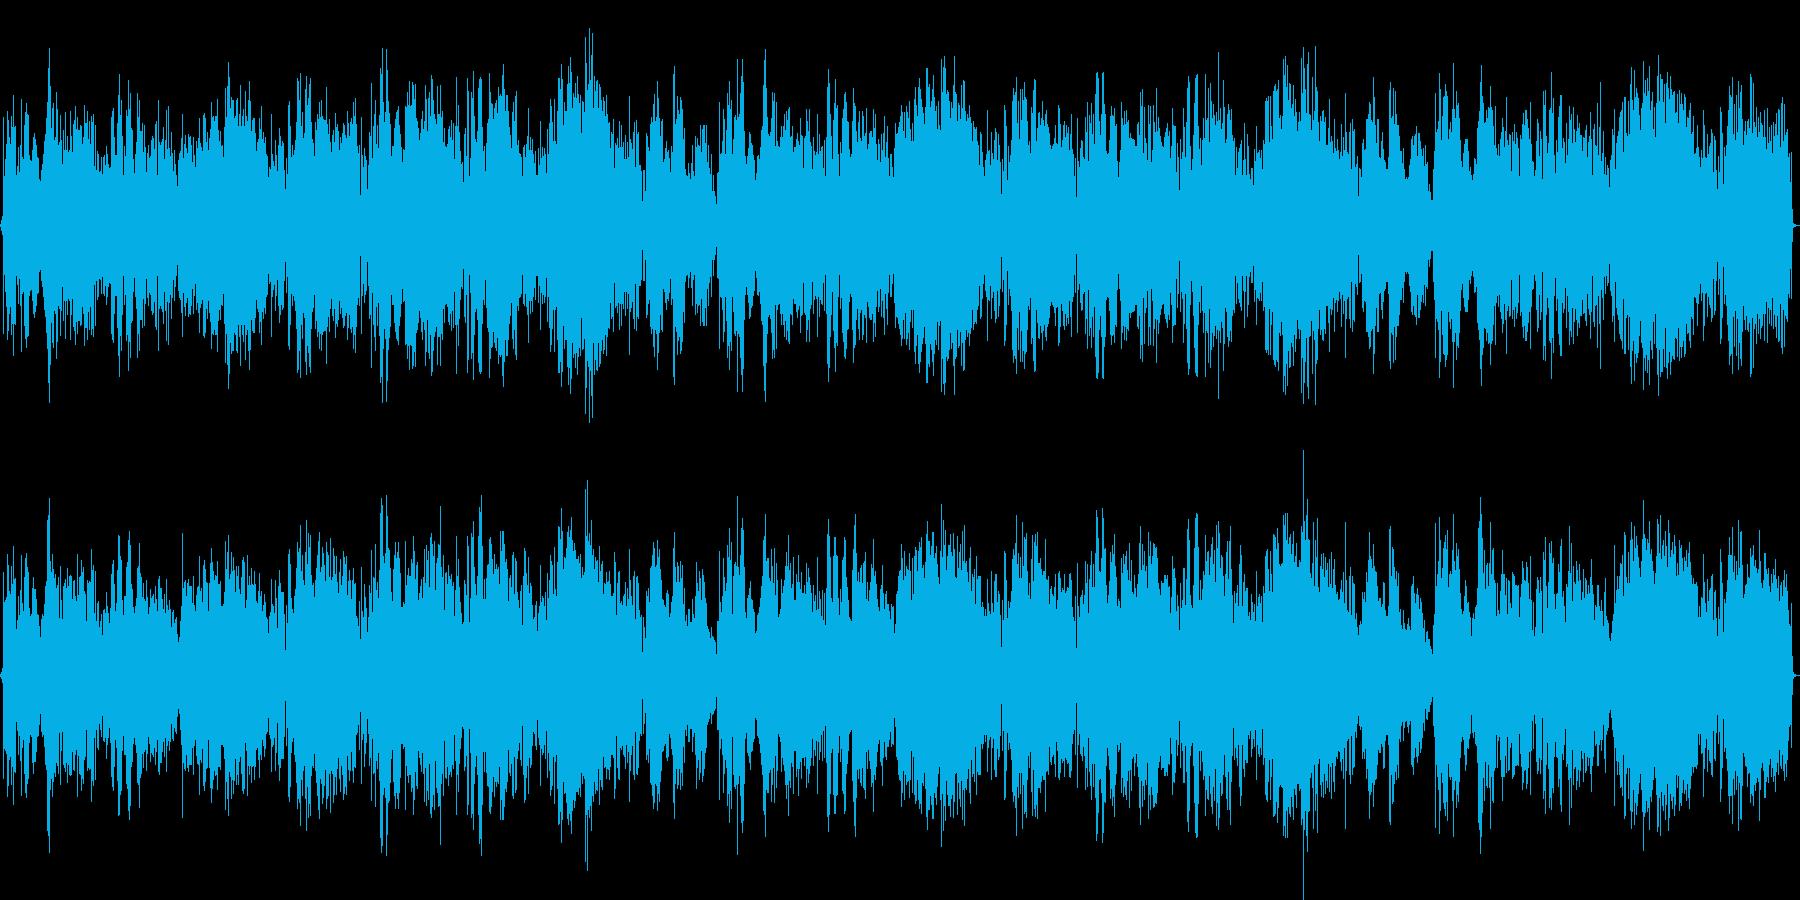 RPGにベストなBGMループの再生済みの波形